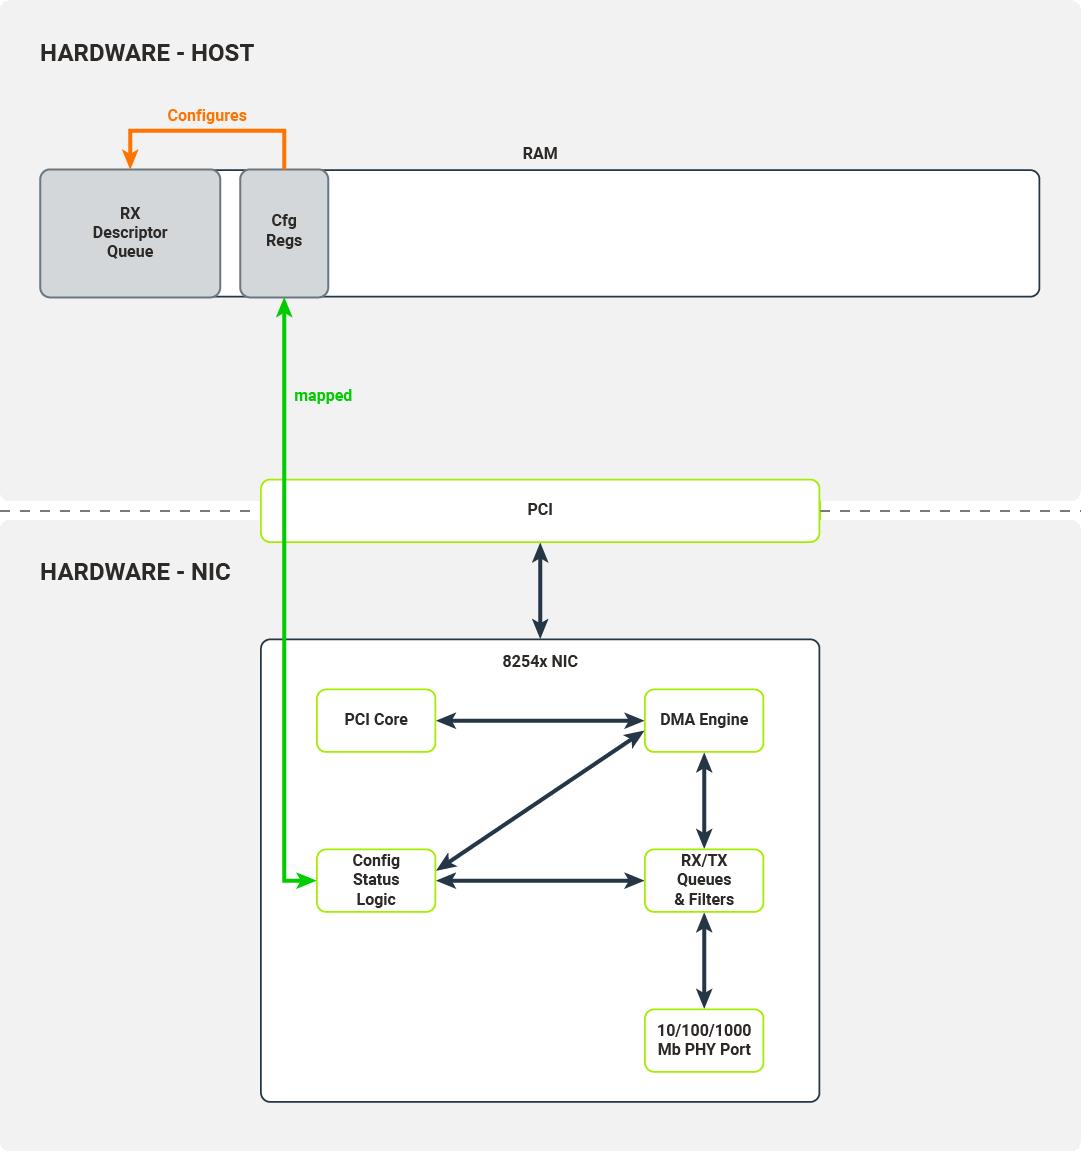 Configuration registers describe the location of the RX descriptor buffer queue